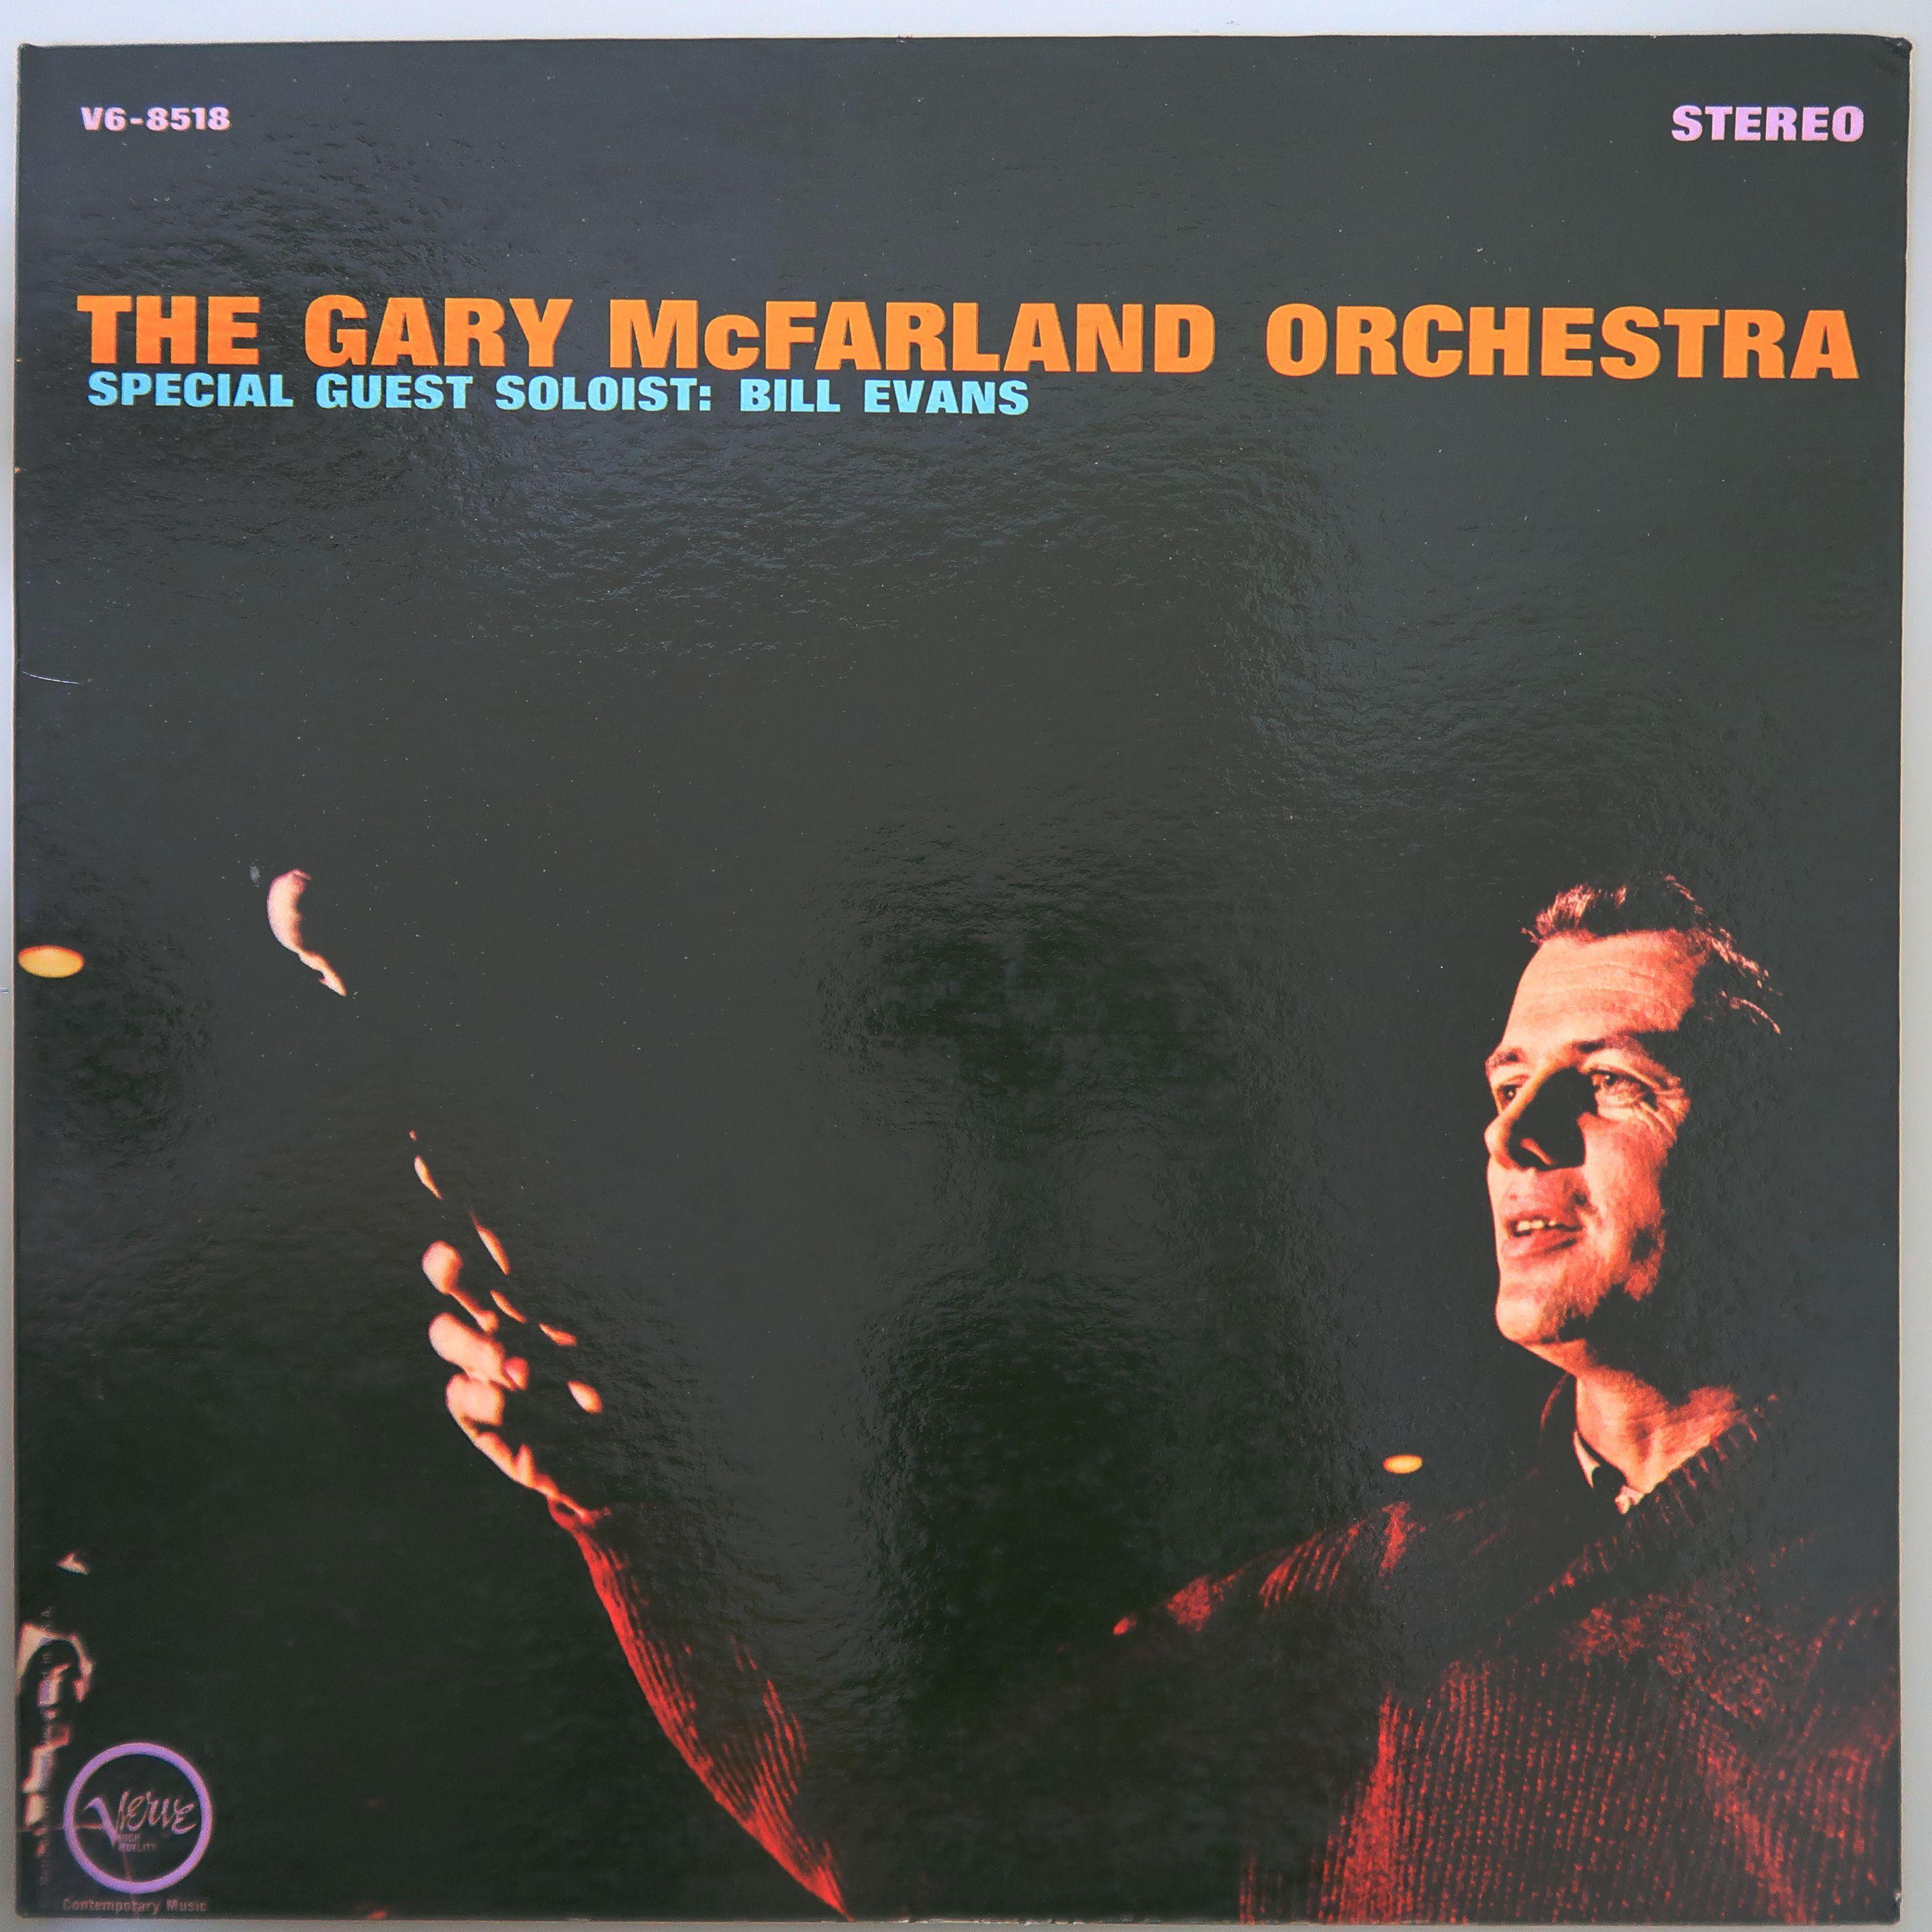 BILL EVANS / THE GARY McFARLAND ORCHESTRA 米オリジナル